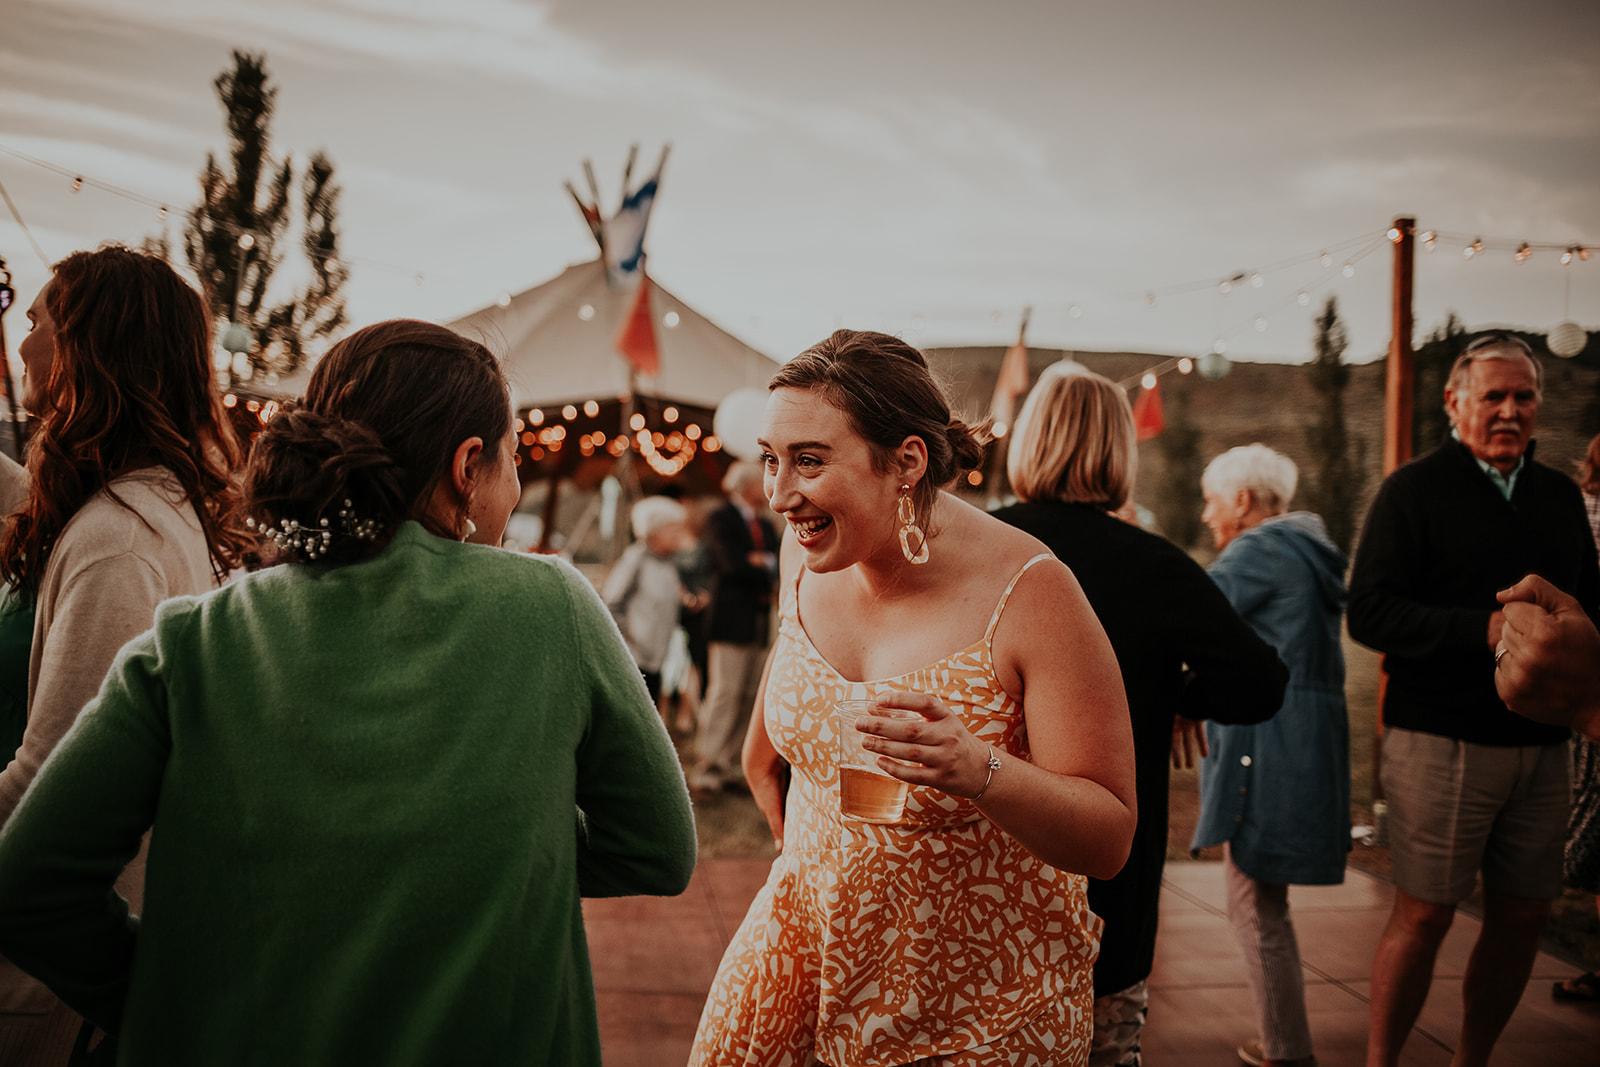 north-cascades-elopement-wedding-winthrop-wedding-photographer-megan-gallagher-photography (45).jpg